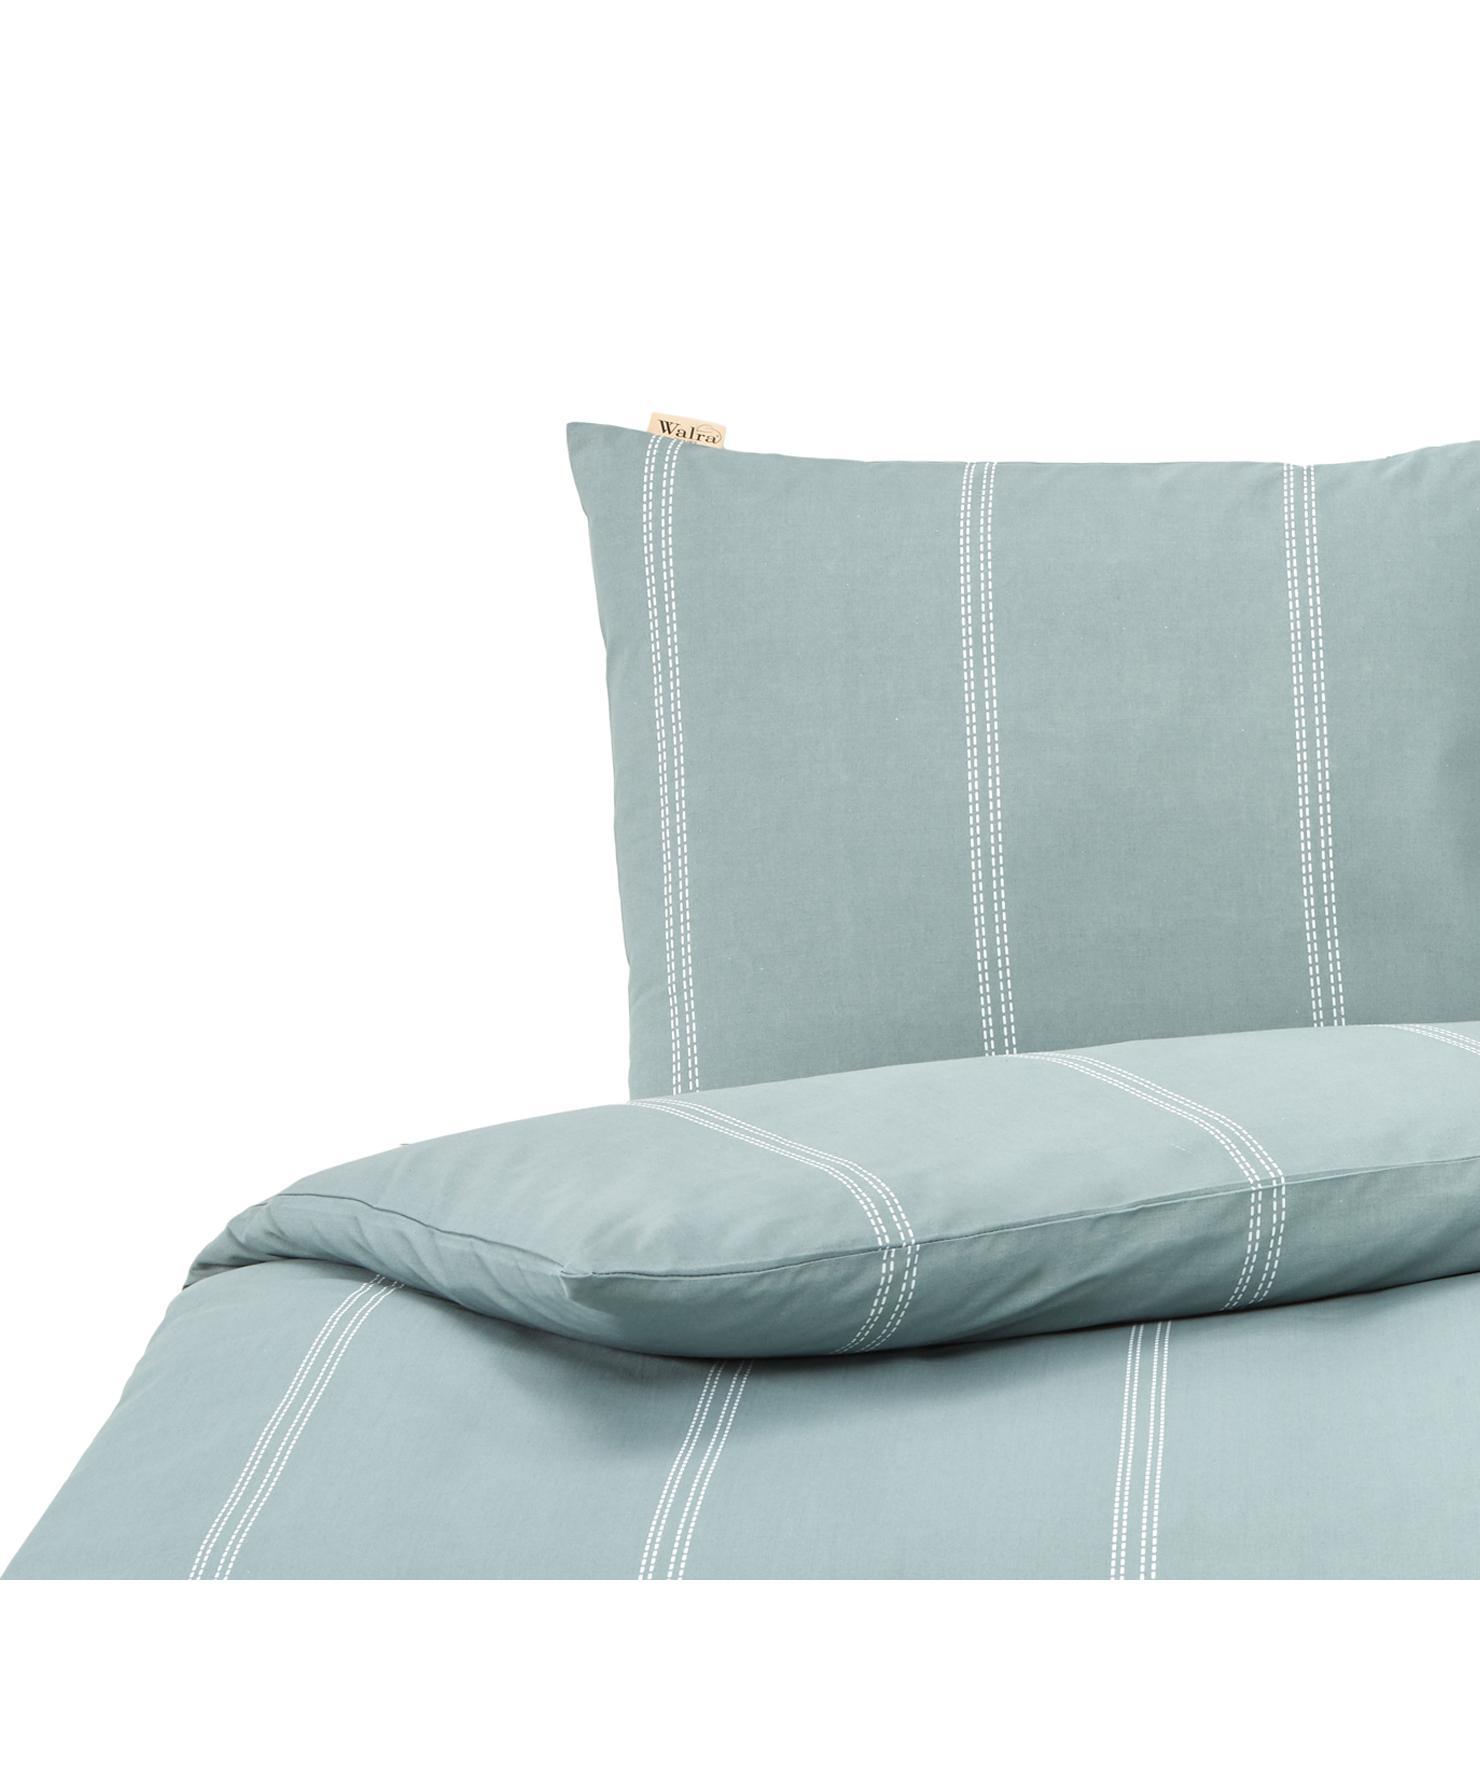 Dekbedovertrek Remade, 52% gerecycled polyester, 48% gerecycled katoen, Jadegroen, wit, 140 x 220 cm